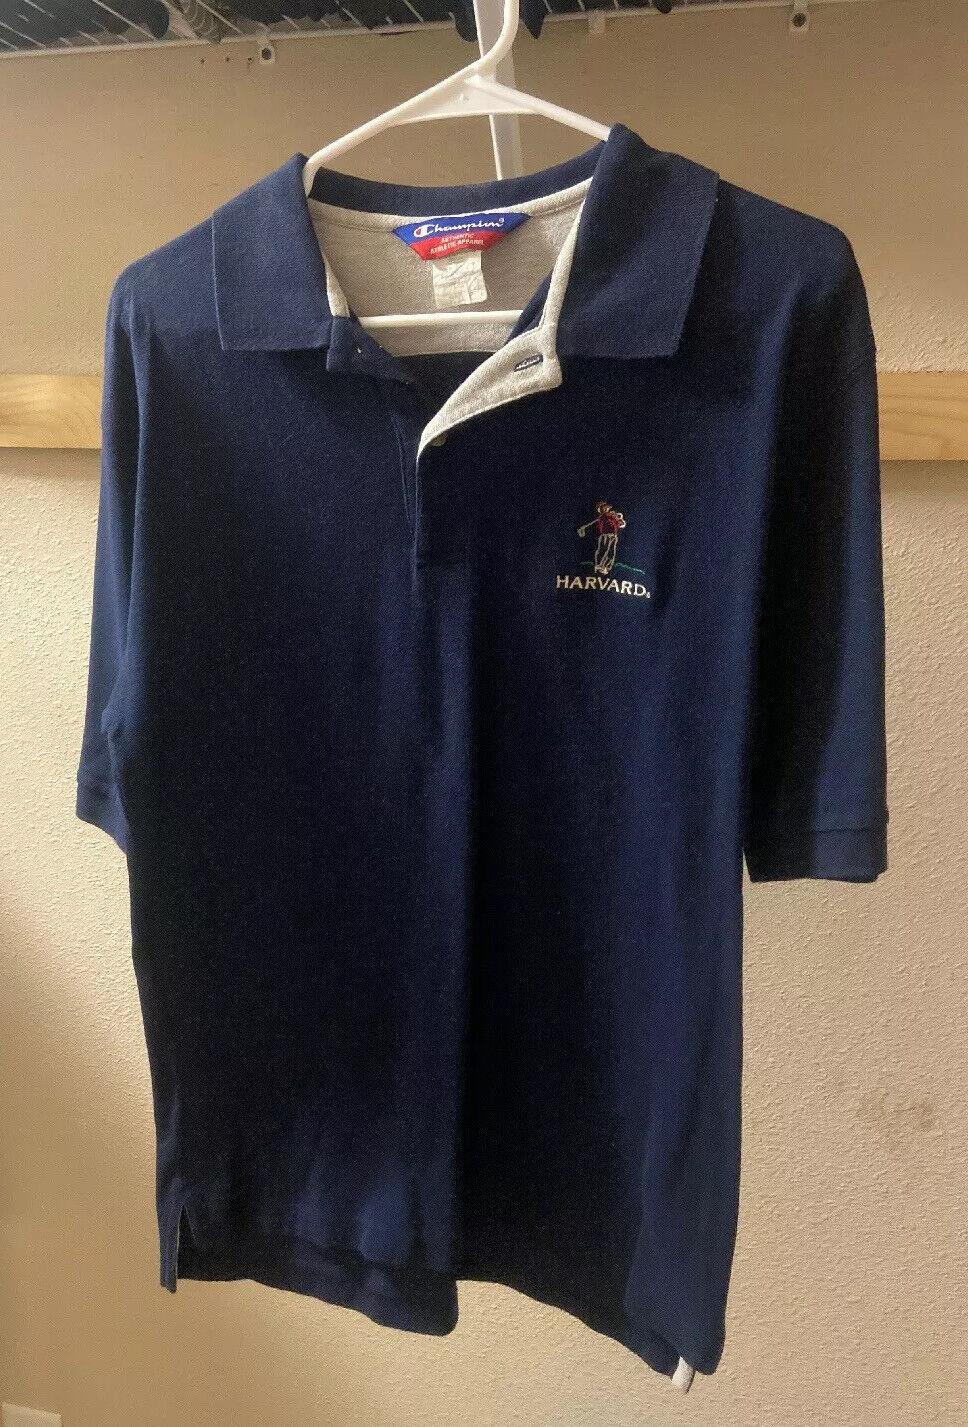 vintage harvard t shirt Polo - image 1